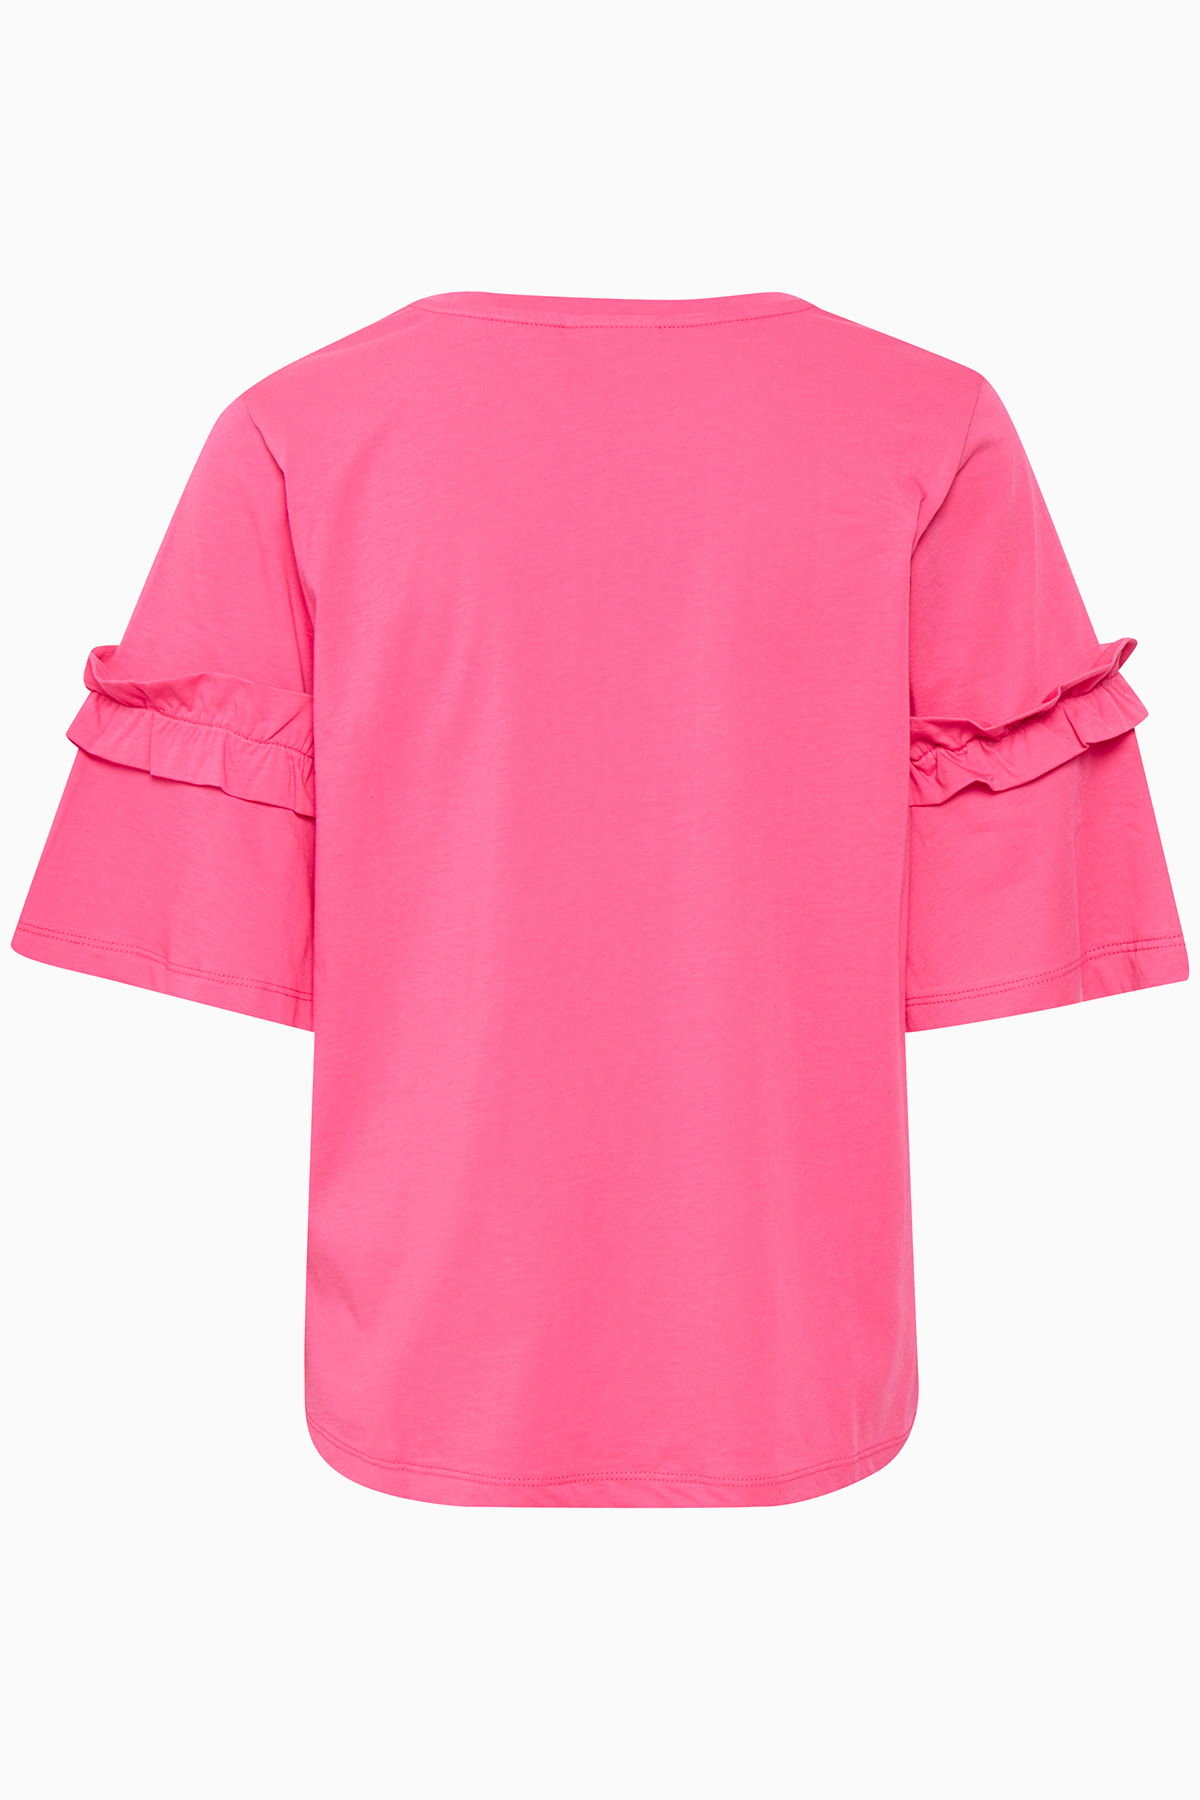 Fuchsia Kurzarm T-Shirt von Kaffe – Shoppen Sie Fuchsia Kurzarm T-Shirt ab Gr. XS-XXL hier